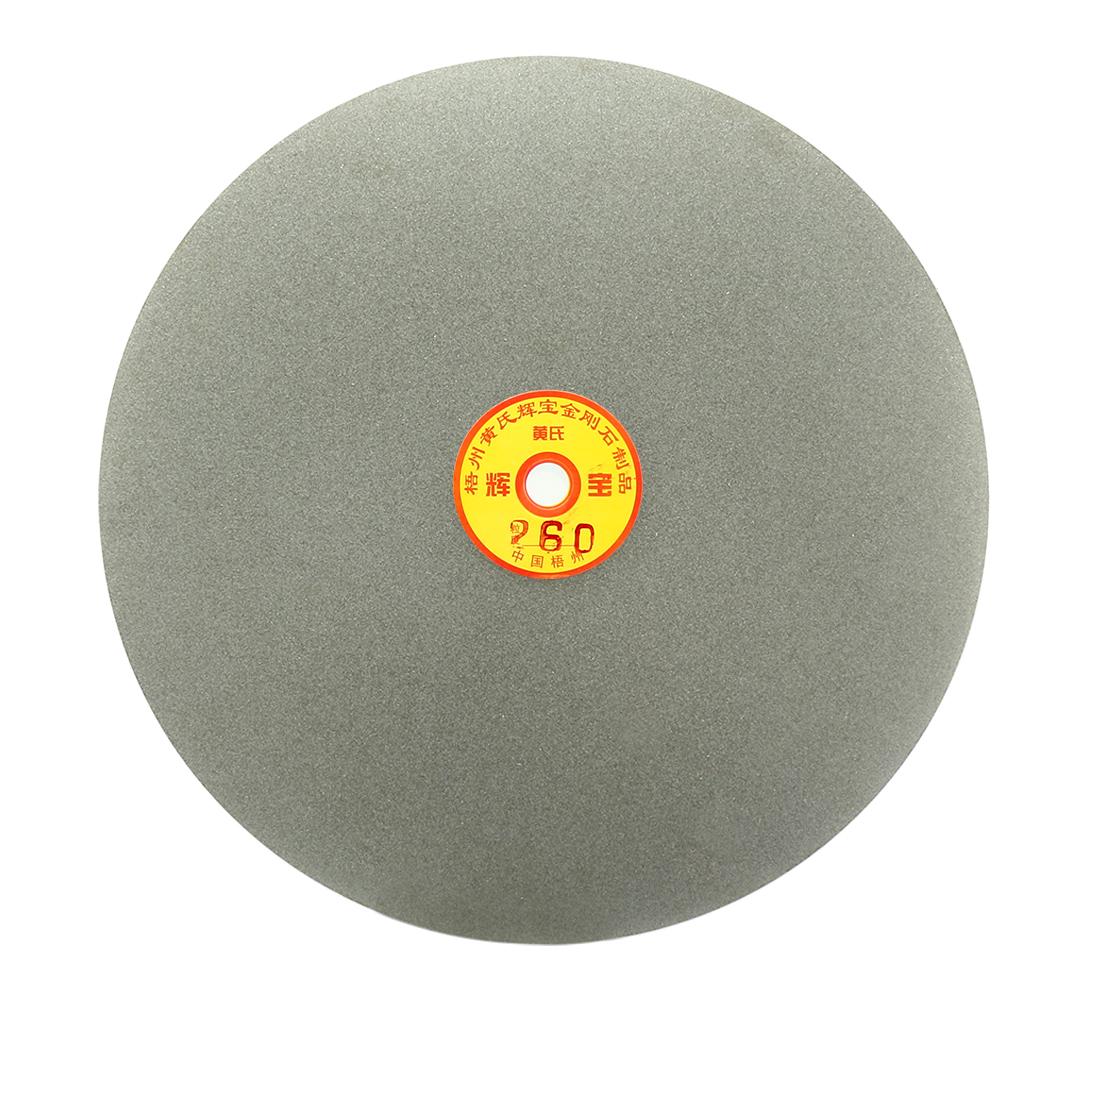 250mm 10-inch Grit 260 Diamond Coated Flat Lap Disk Wheel Grinding Sanding Disc